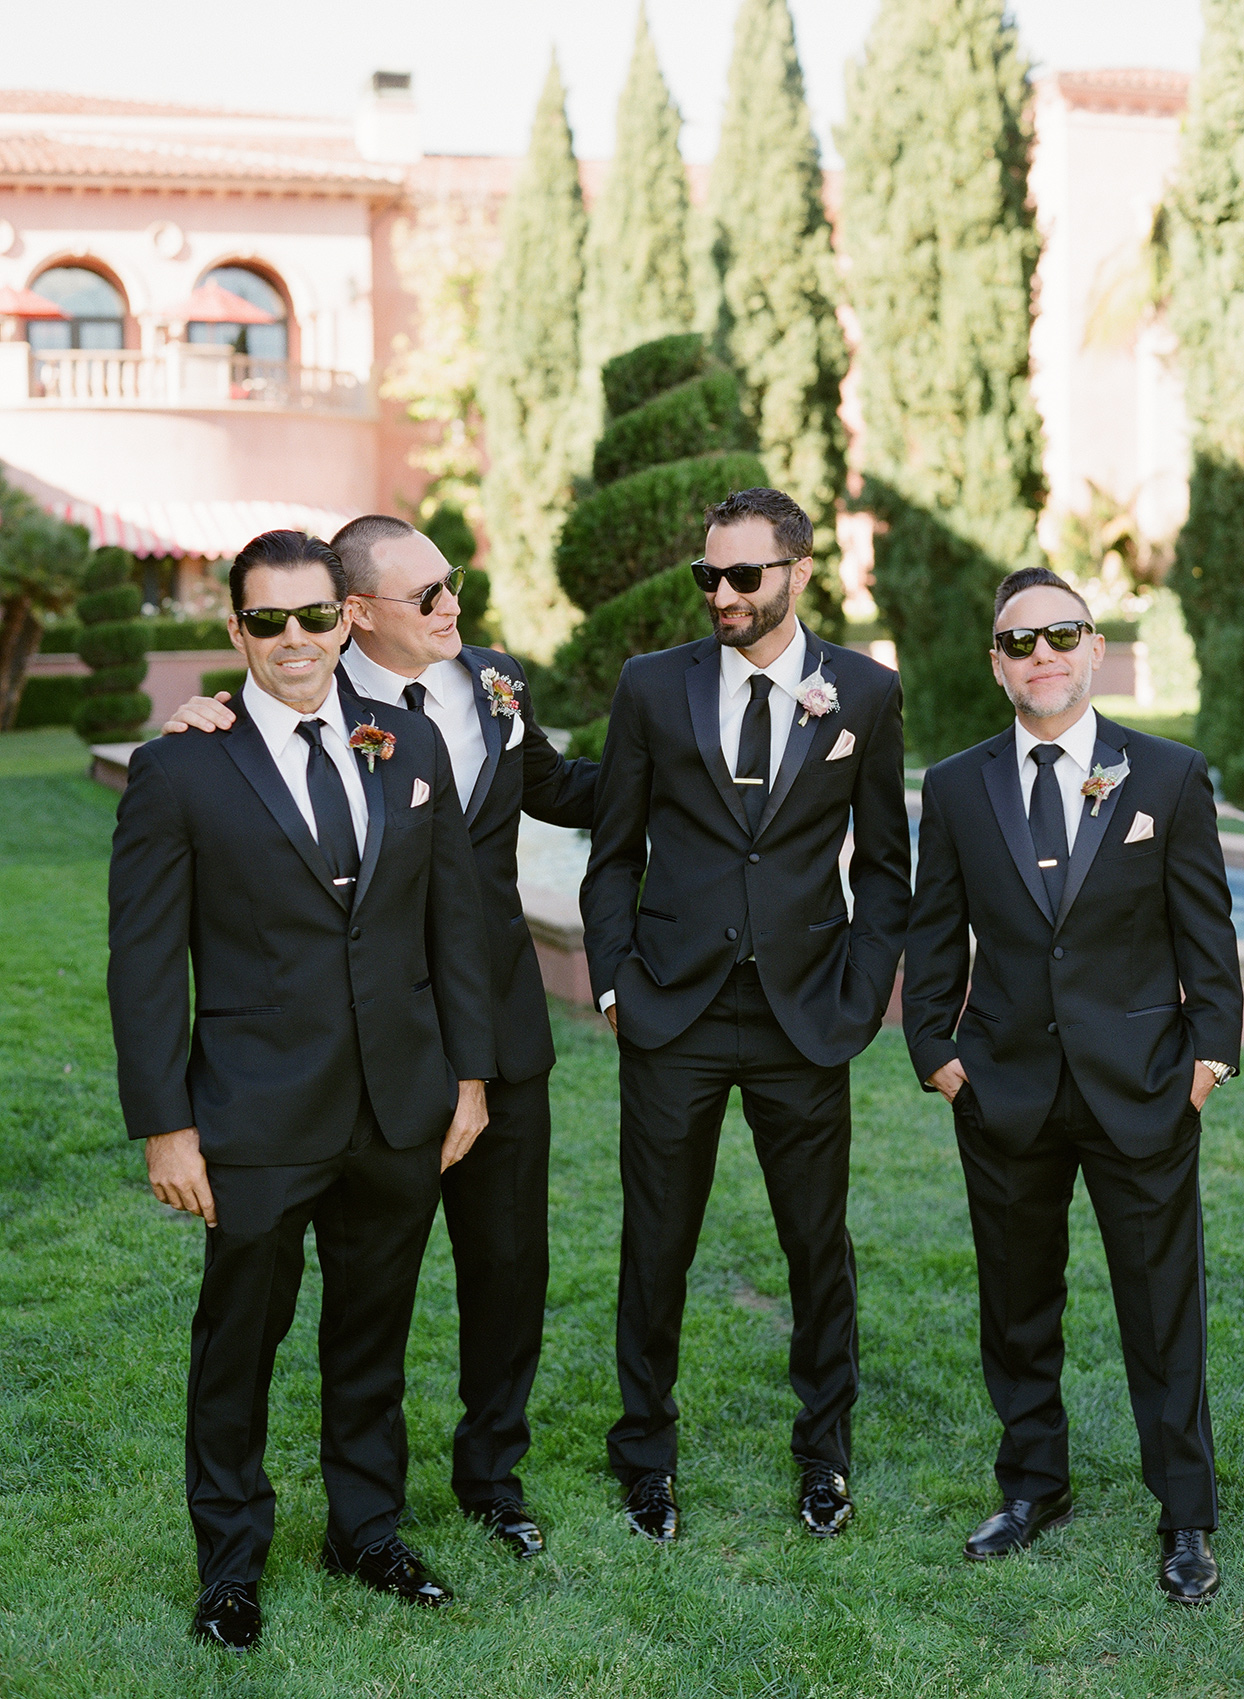 wedding groomsmen in black suits and sunglasses